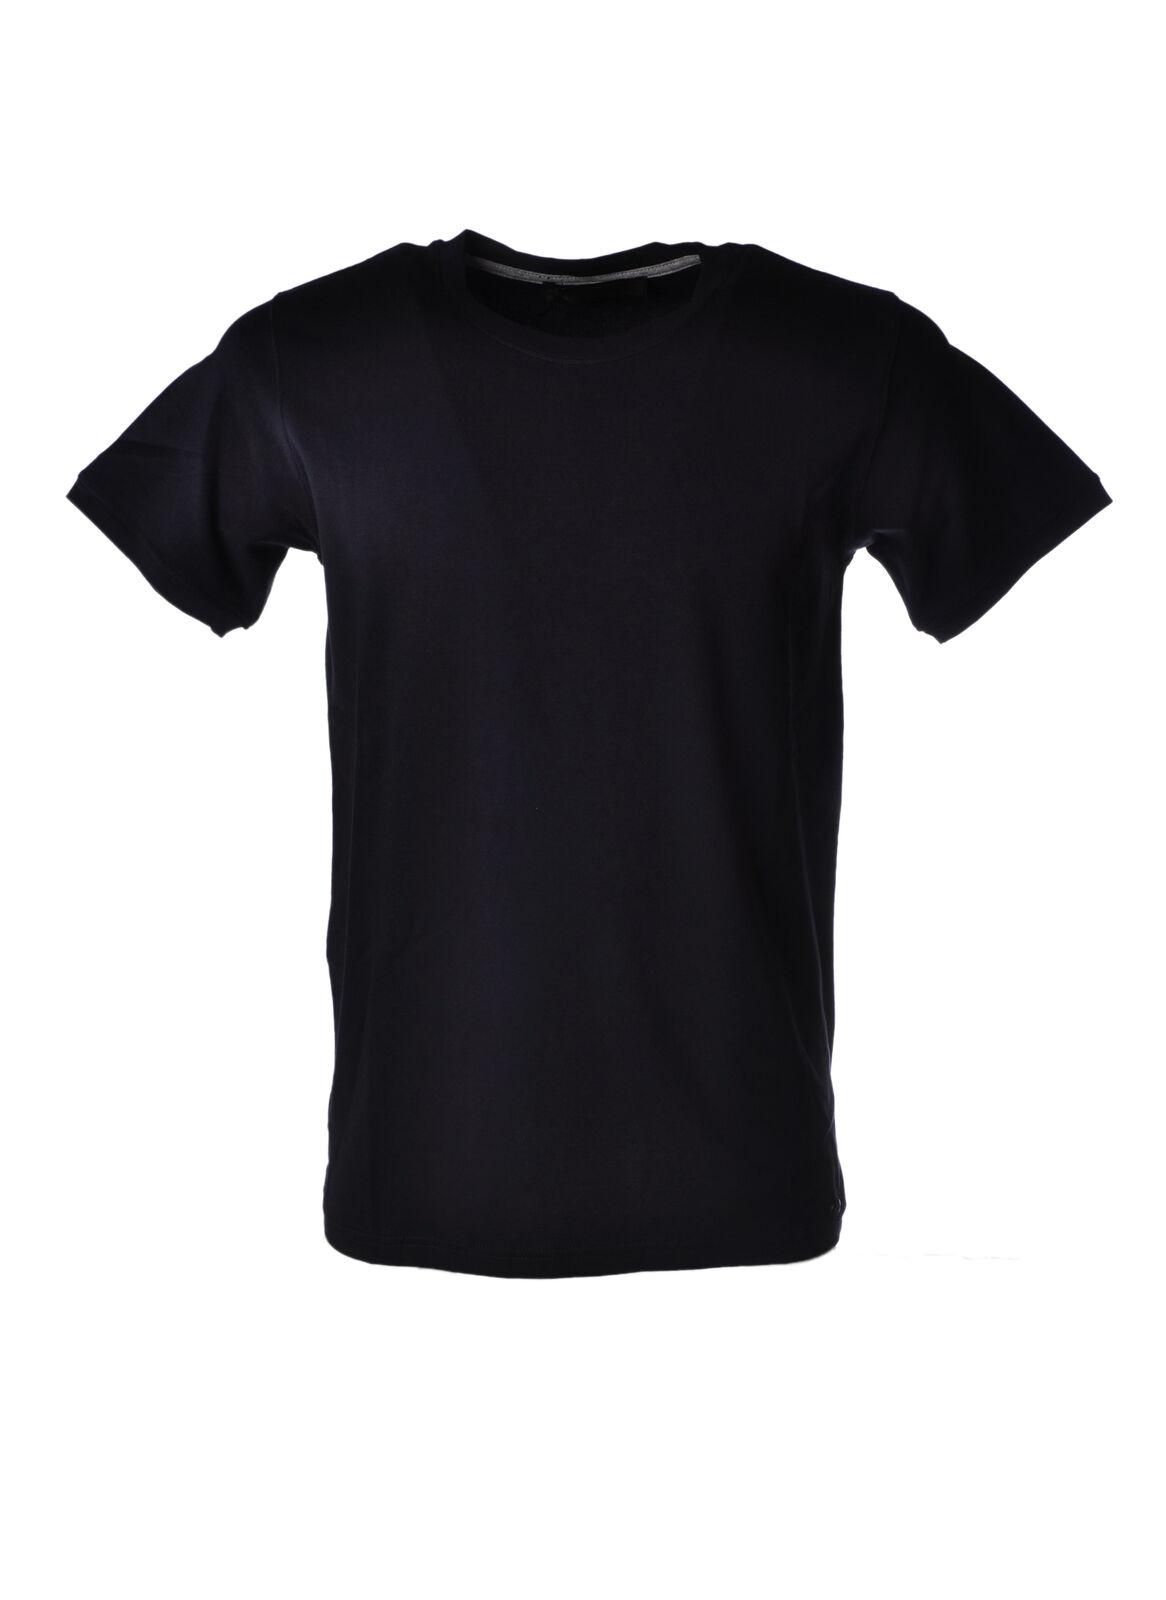 Laboratori Italiani - Topwear-T-shirts - Man - bluee - 5017405C180752